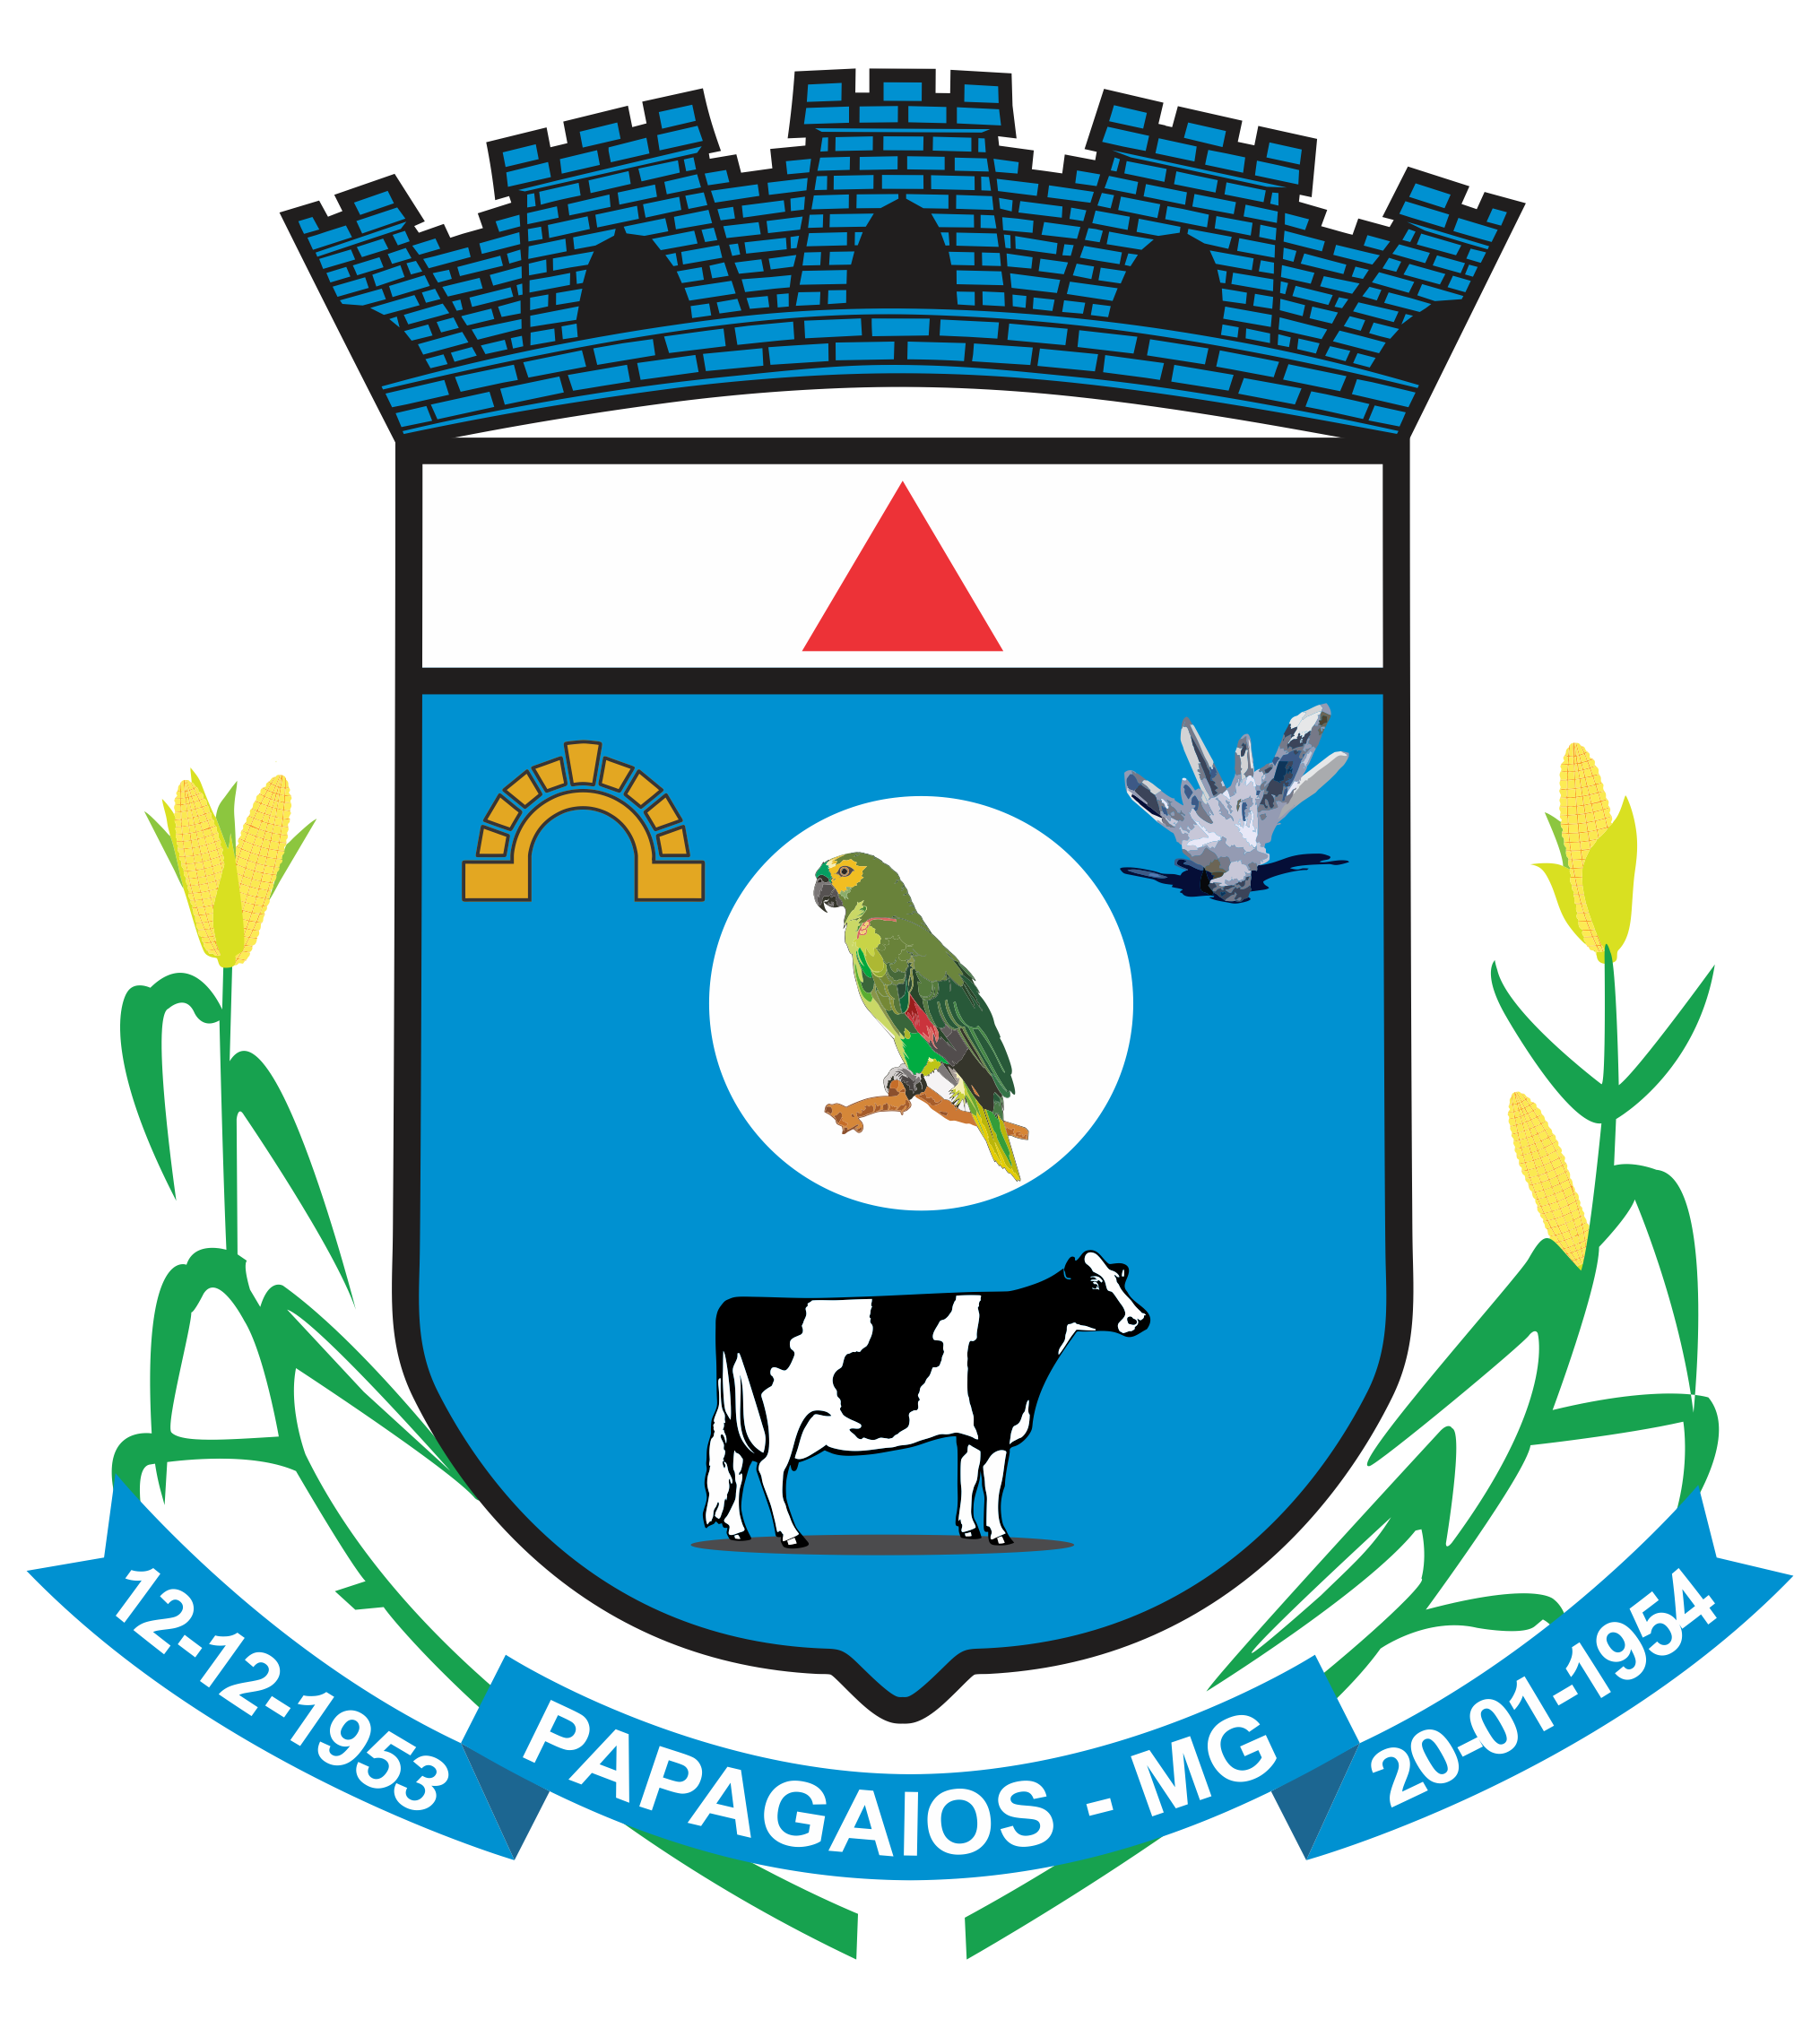 Logo da entidade CÂMARA MUNICIPAL DE PAPAGAIOS - MG